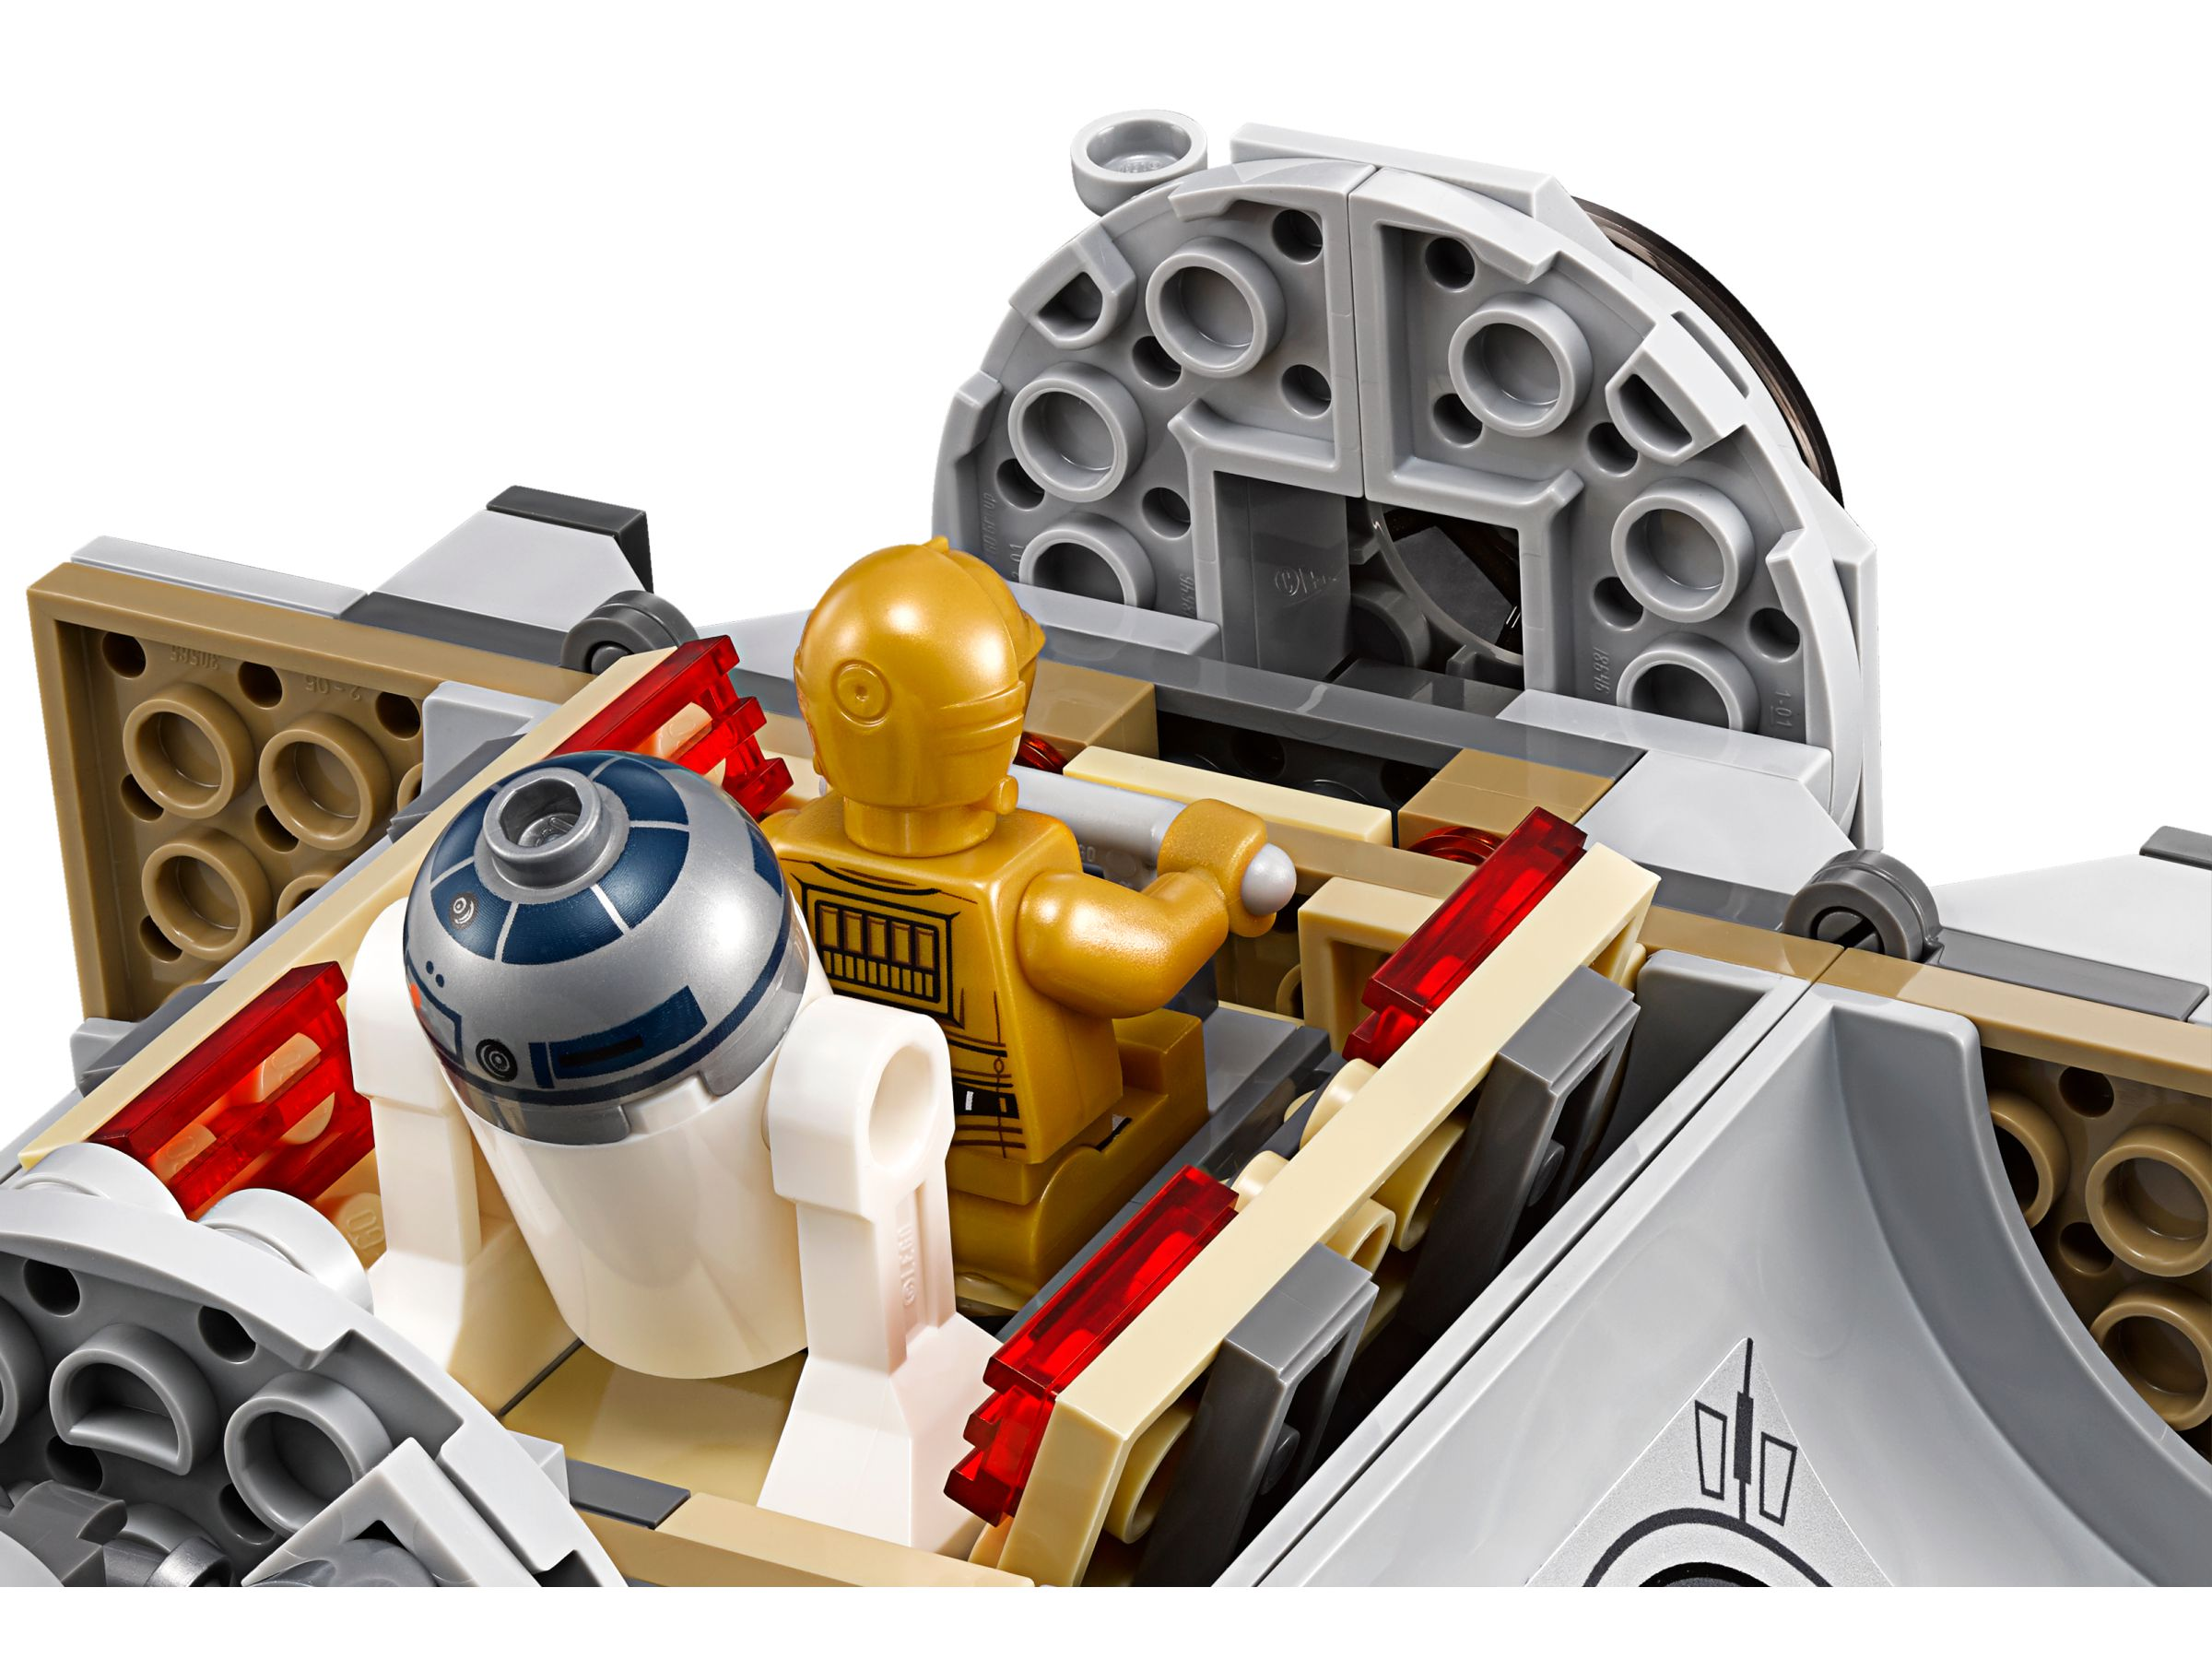 lego 75136 droid escape pod star wars 2016 ab 26 90 droid escape pod brickmerge. Black Bedroom Furniture Sets. Home Design Ideas